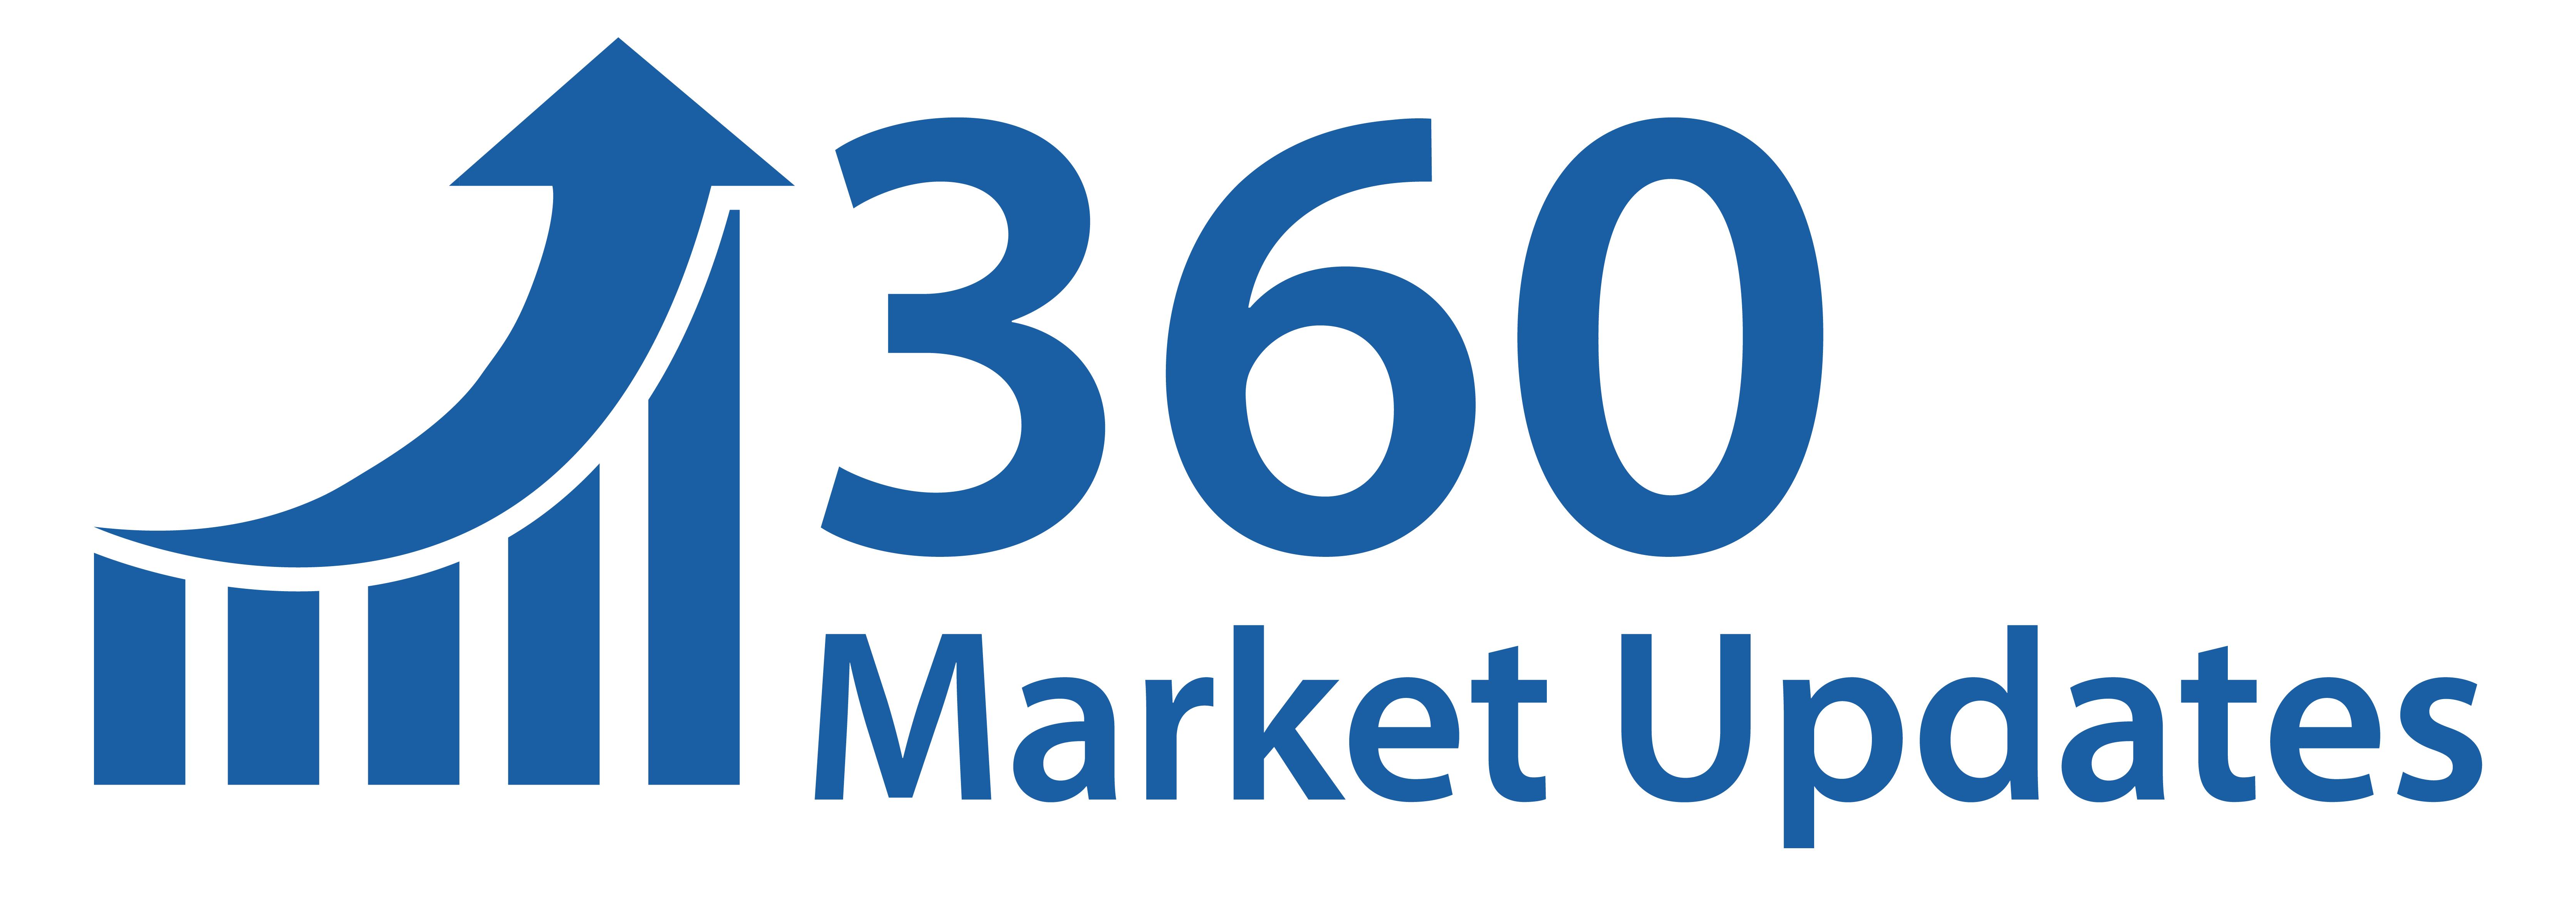 Beryllium Matrix Composite Market 2020 : Global Industry Trends, Growth, Size, Segmentation, Future Demands, Latest Innovation, Sales Revenue by Regional Forecast to 2025